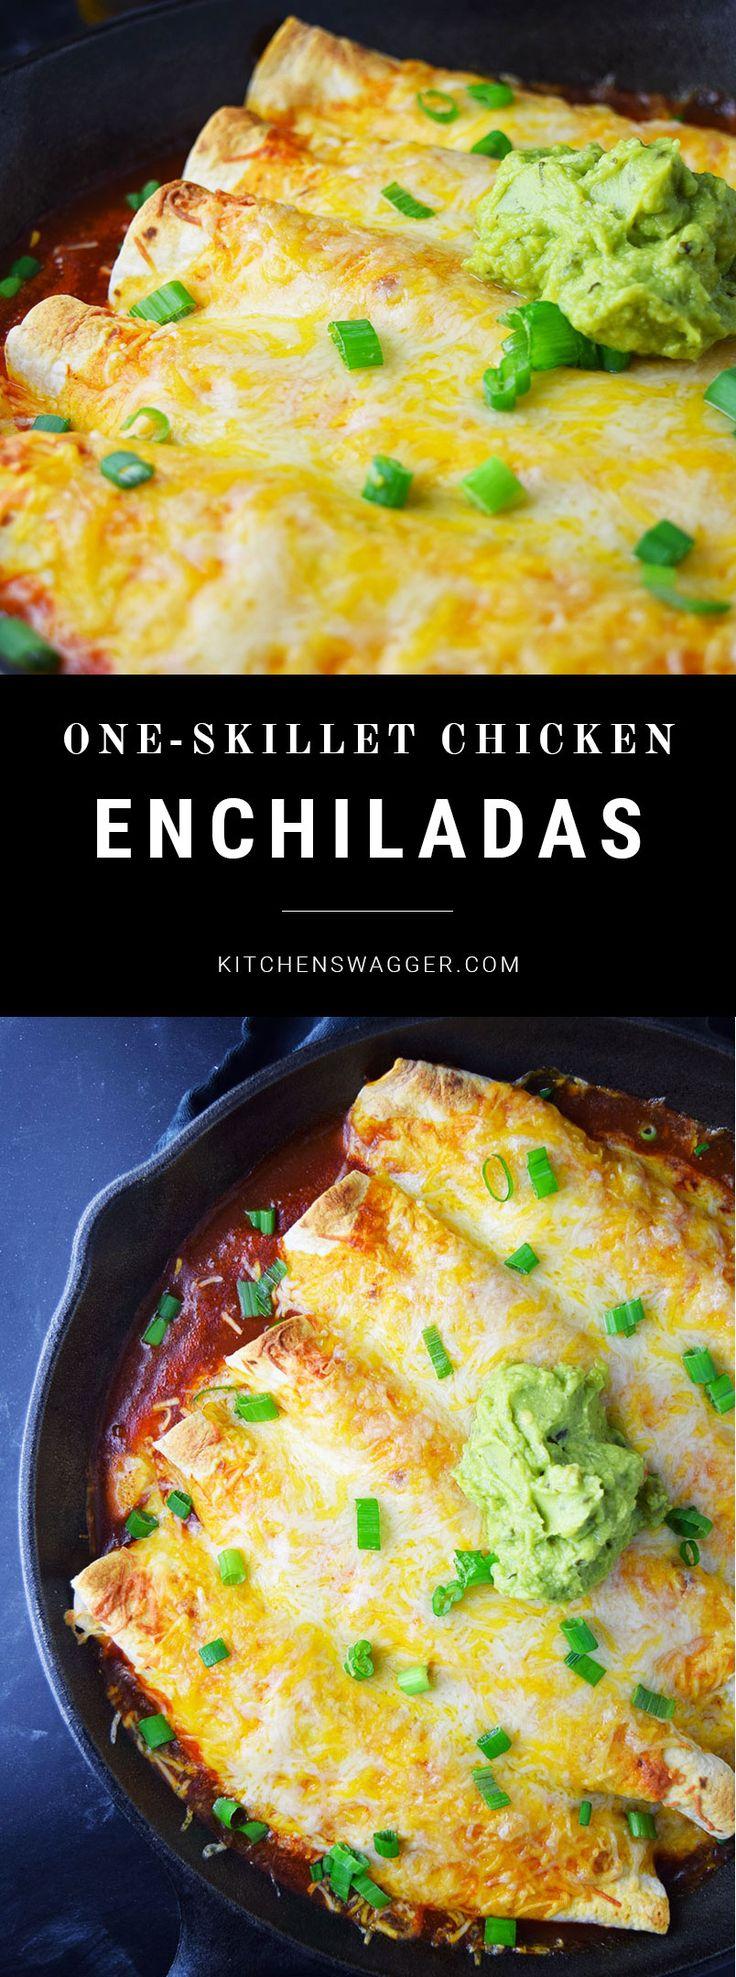 100+ Iron skillet recipes on Pinterest | Skillet cooking ...